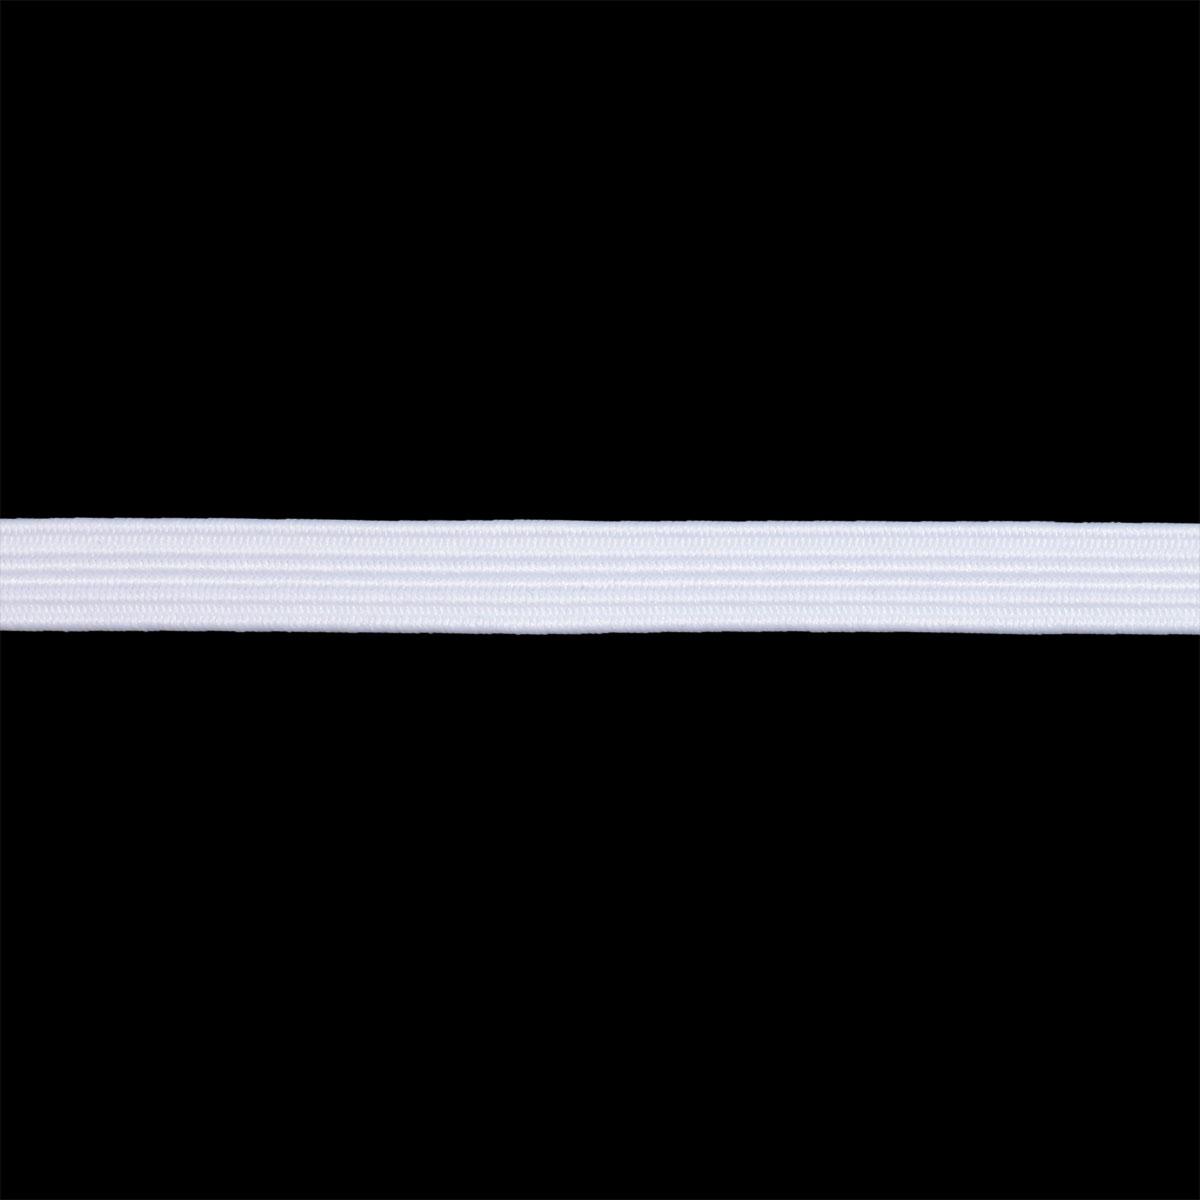 15-1019/01 Резинка вязаная 7мм*50м, белая